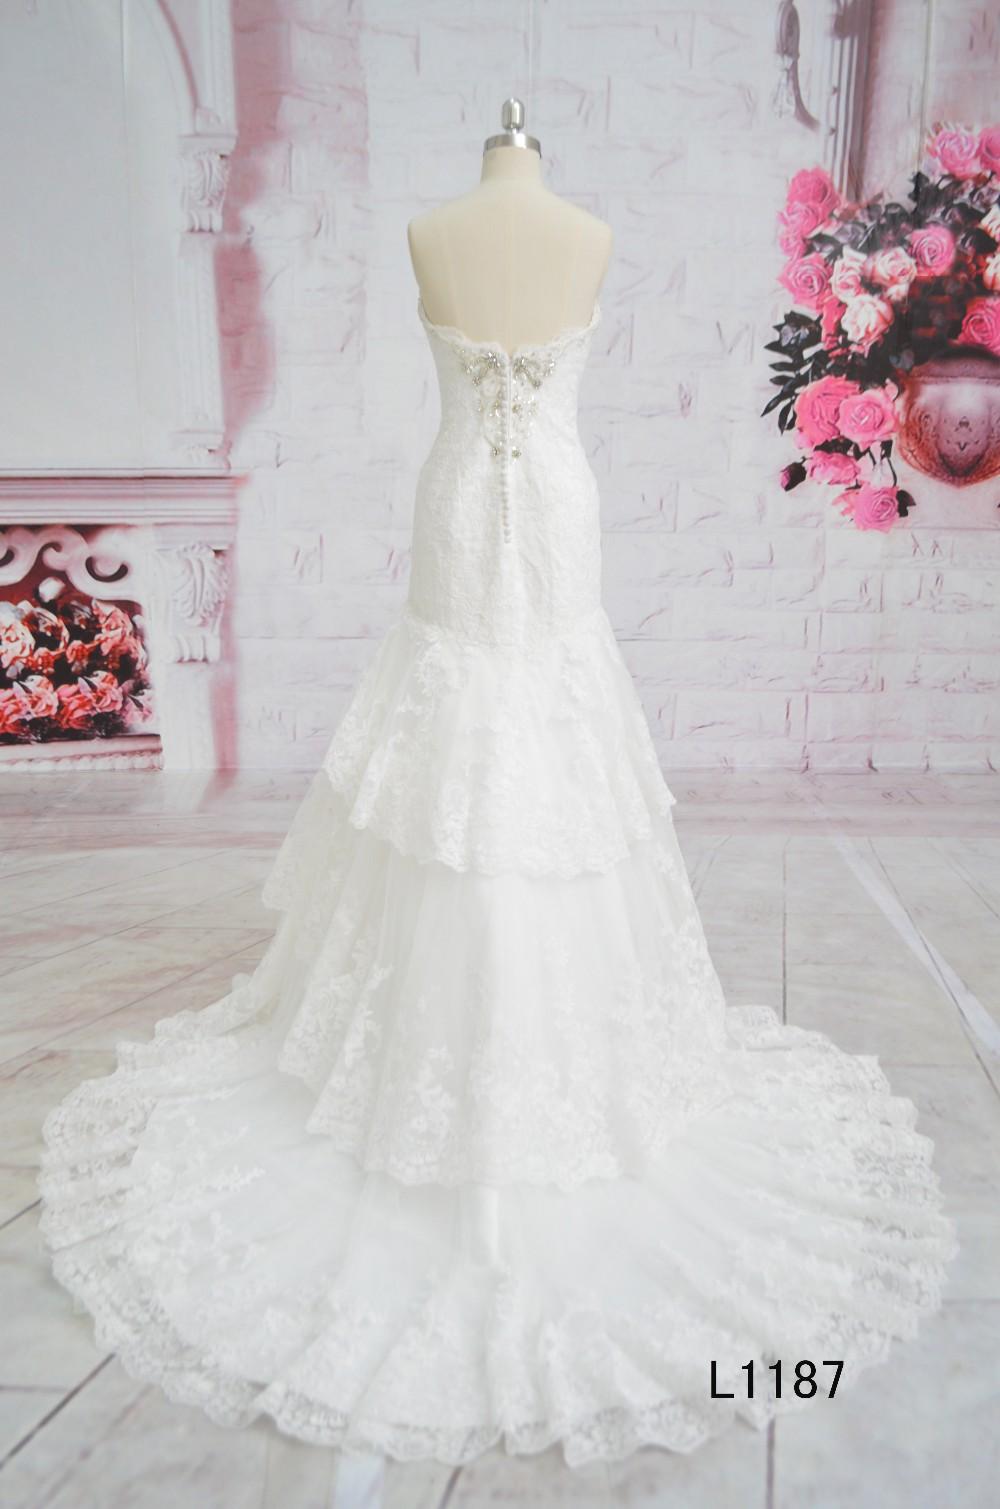 1d77b50e10 Divisoria Wedding Gowns And Bridal Dress Meirmaid Dress Wedding Gown ...